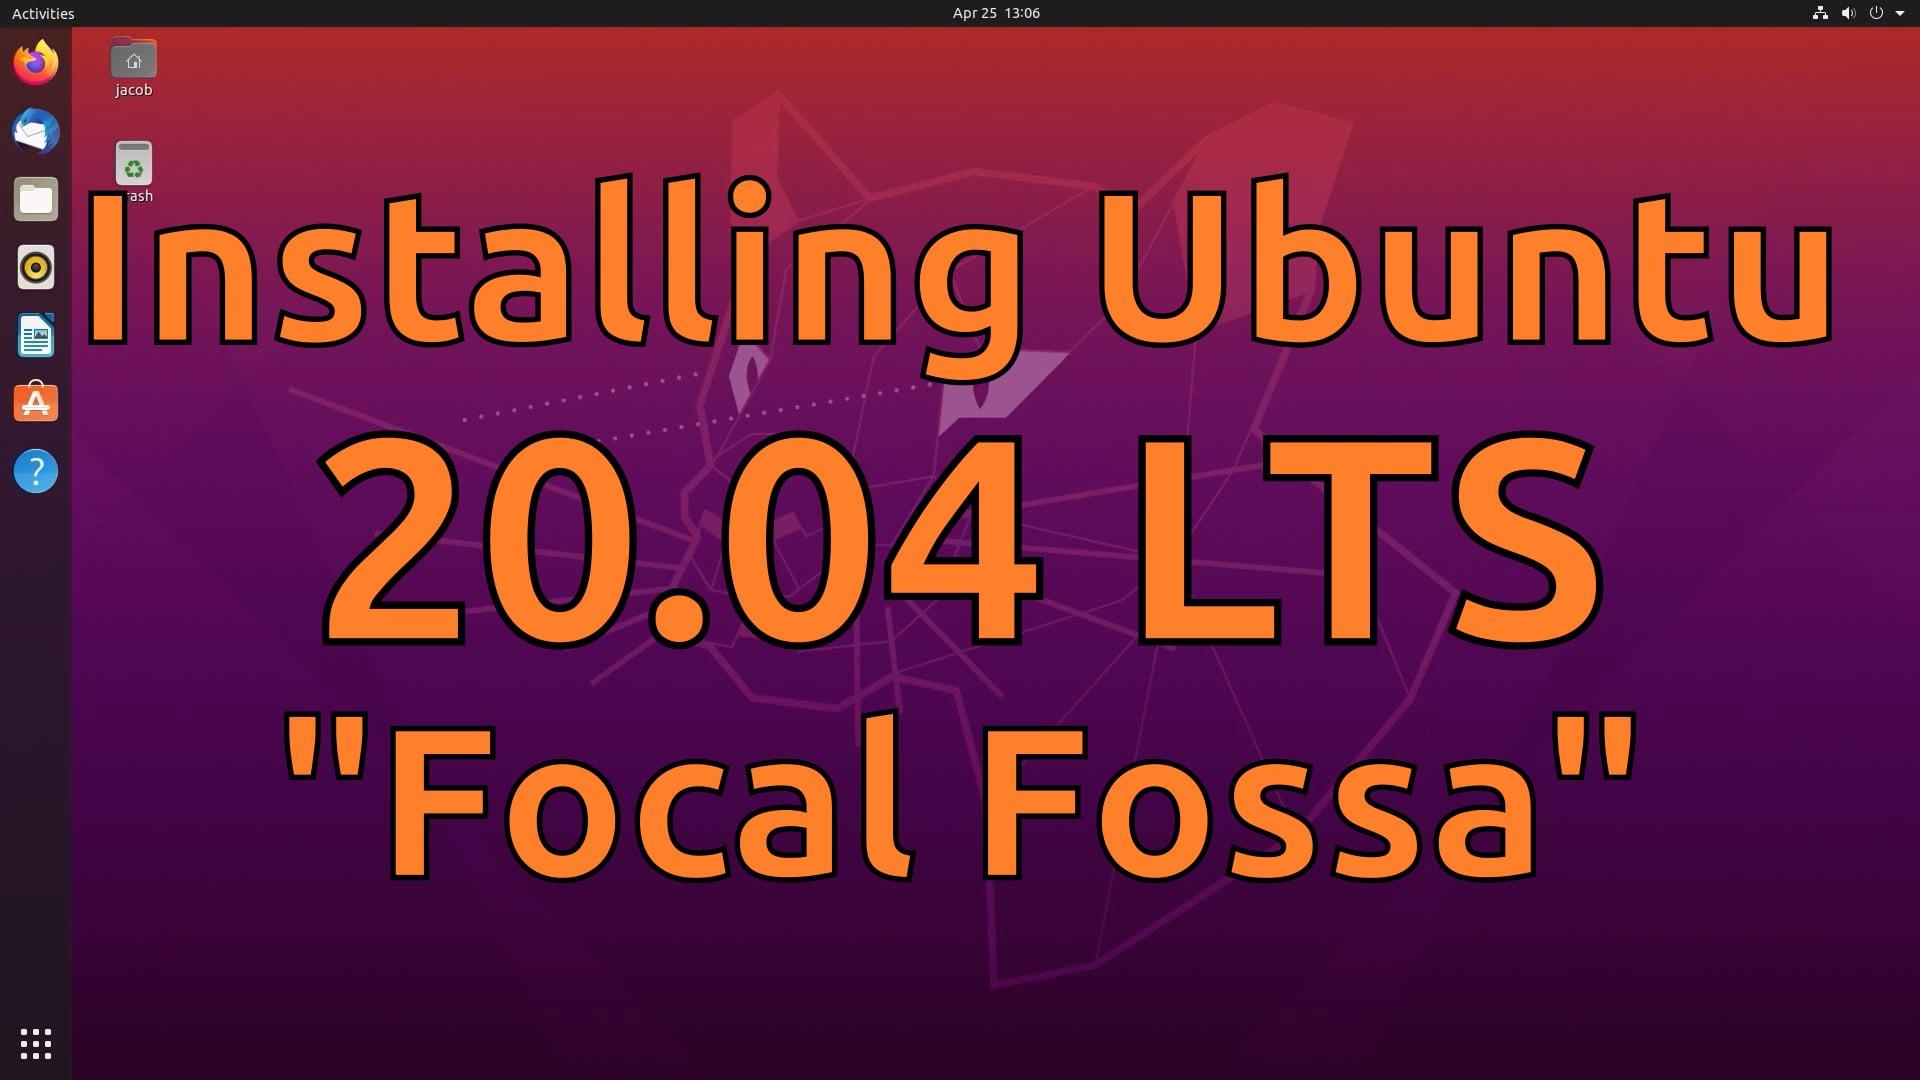 Installing Ubuntu 20.04 LTS